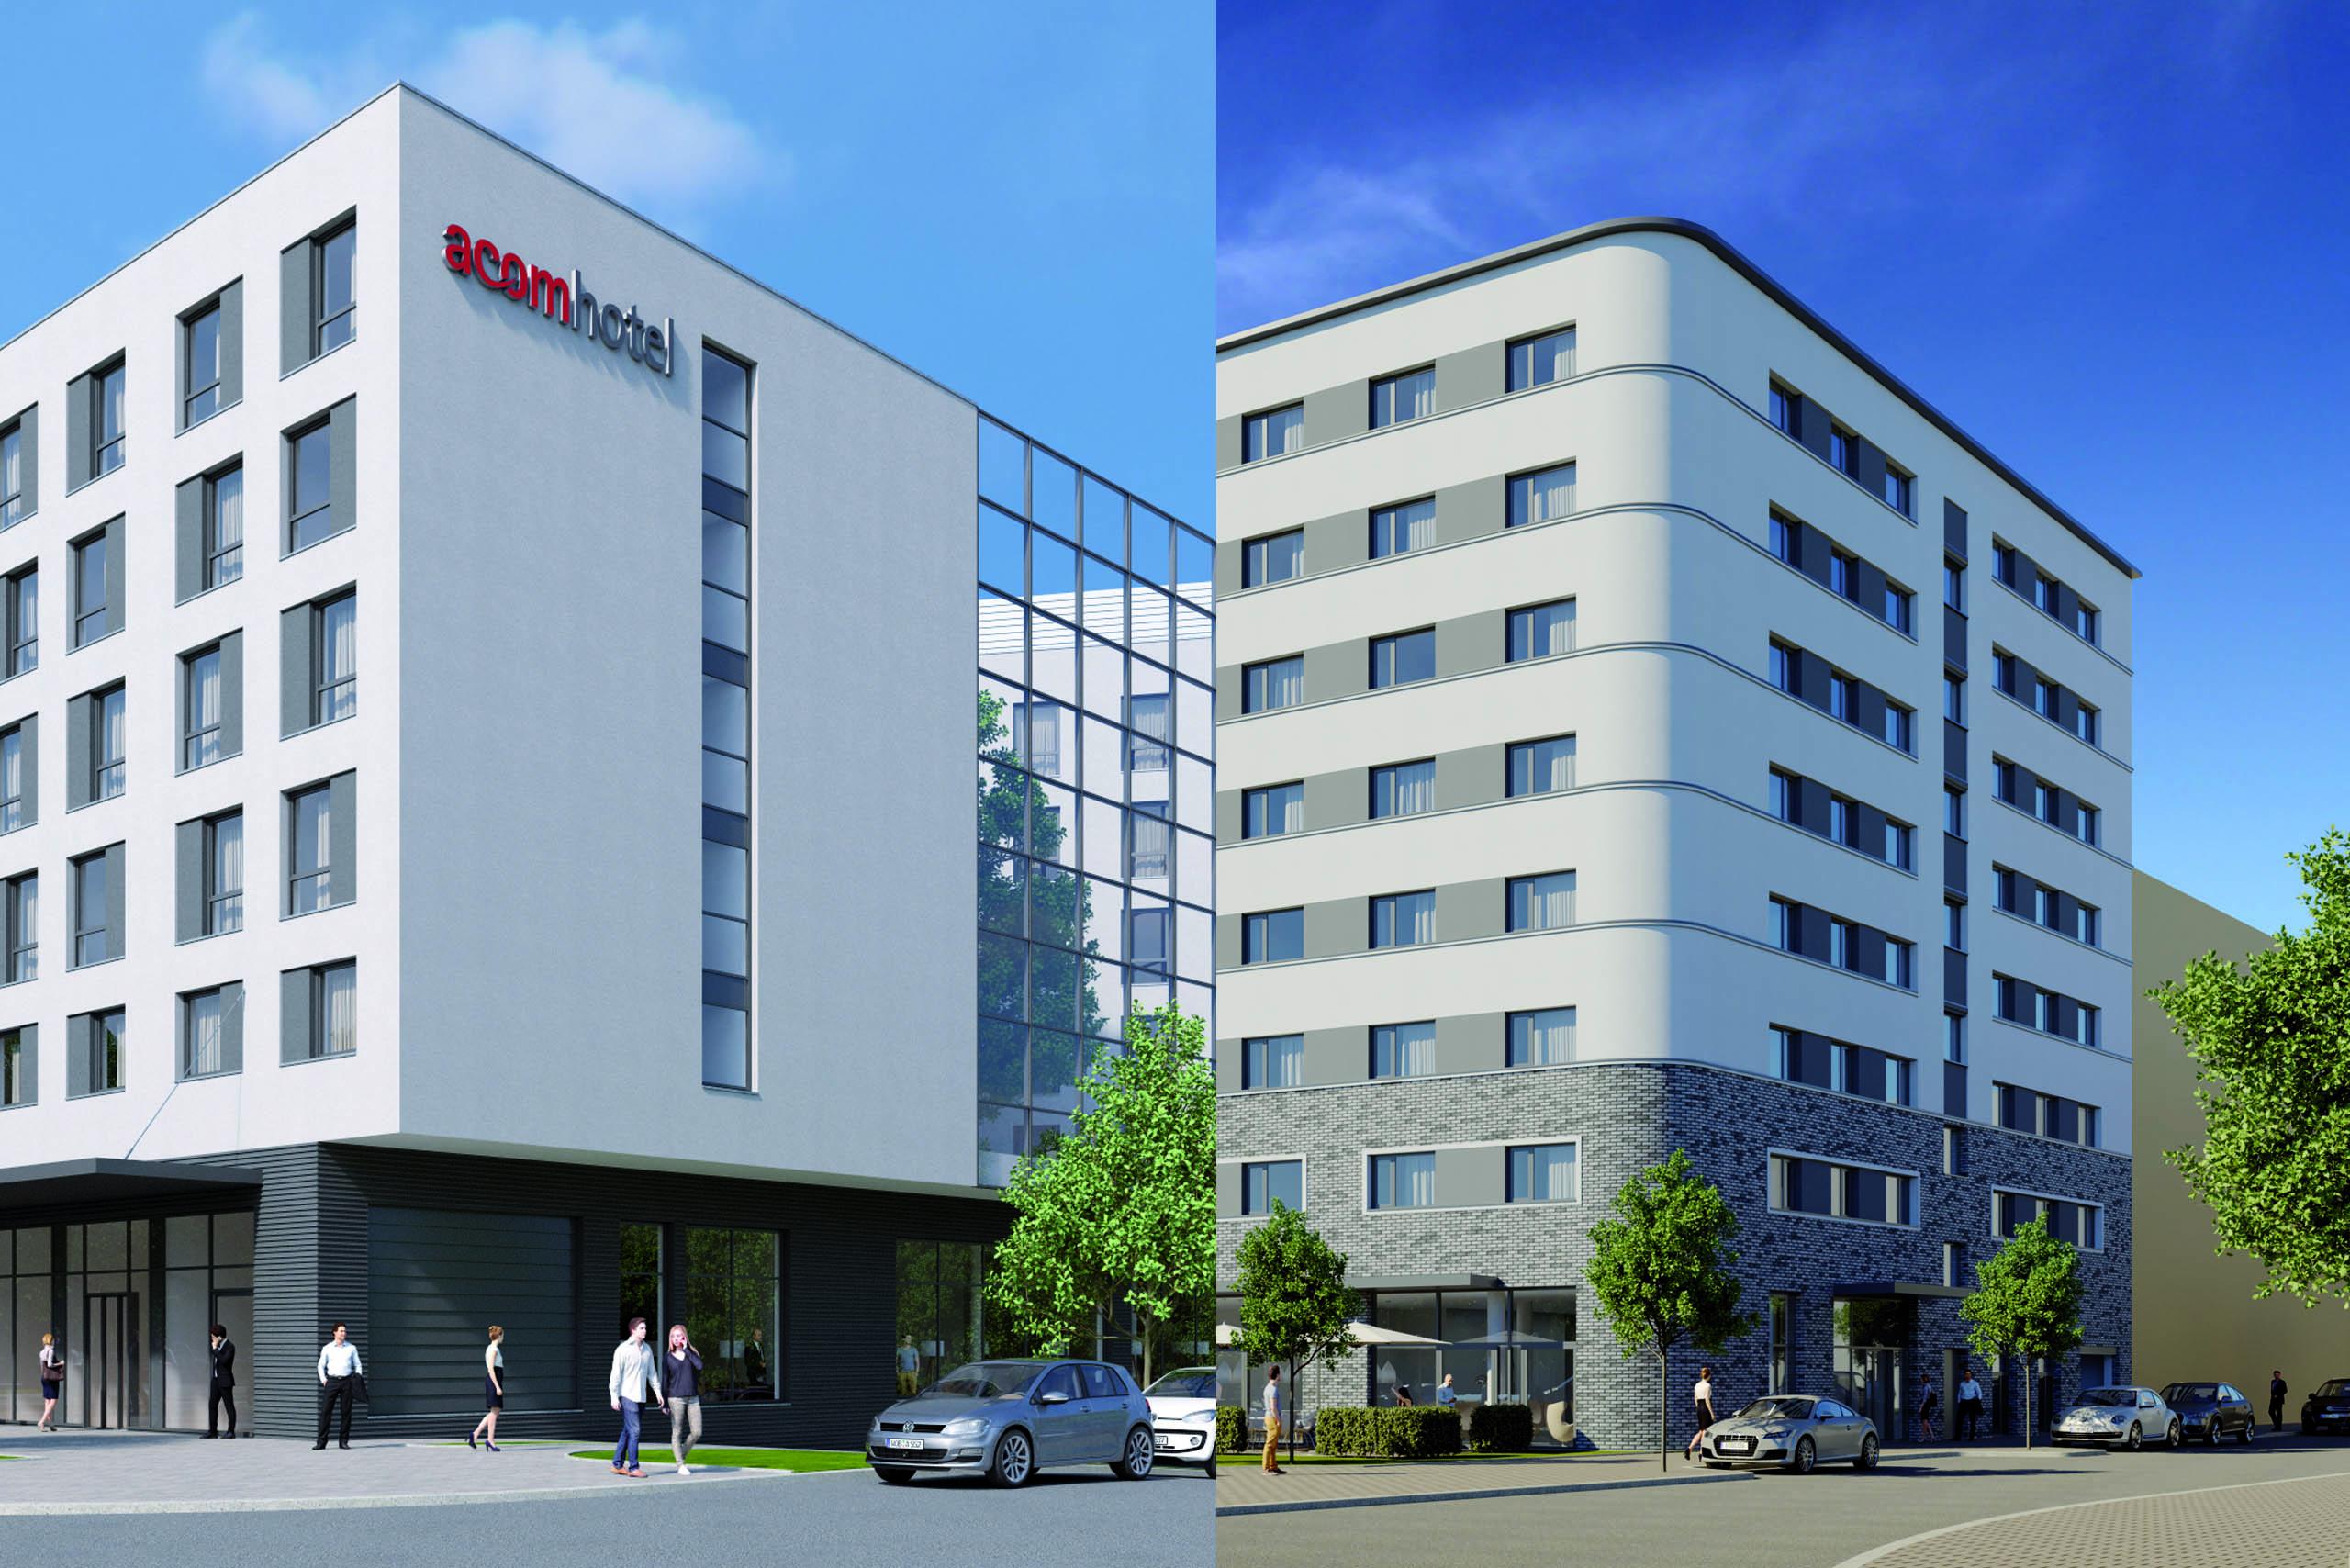 Premier Inn Hotel Stuttgart + Saarbrücken